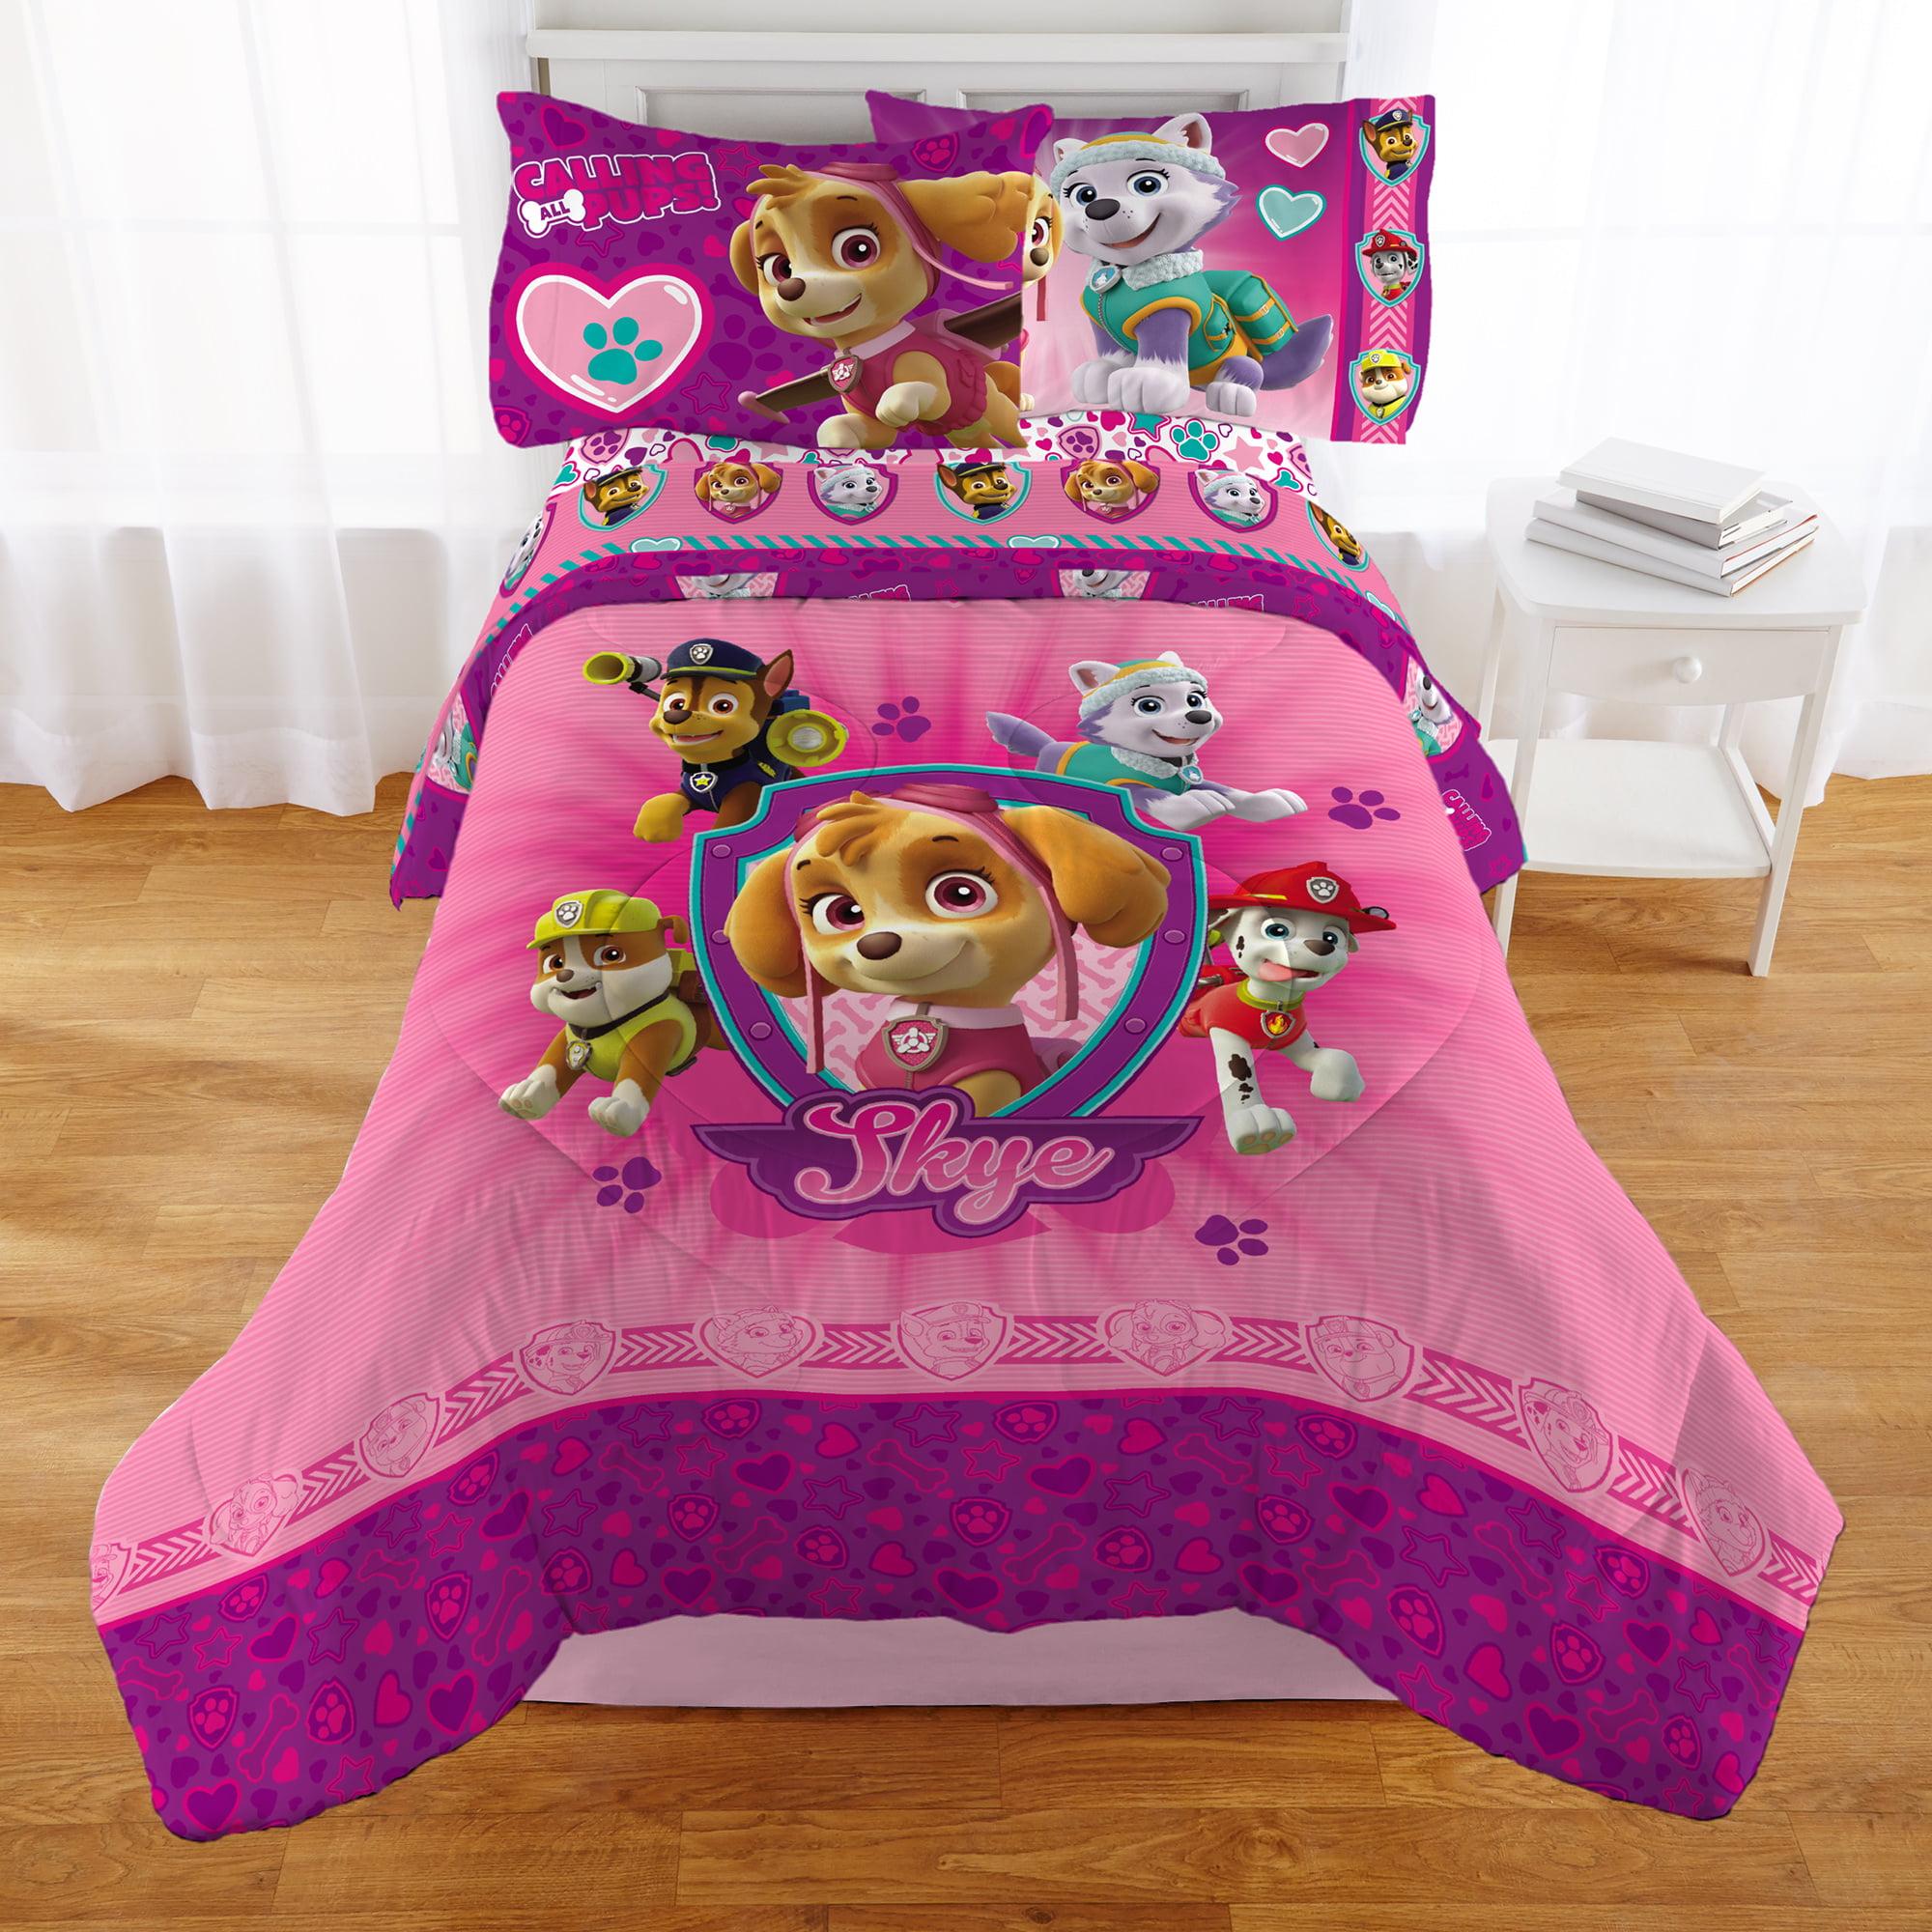 Paw Patrol Girl 'Puptacular' Kids Bedding Comforter, Twin by Franco Manufacturing